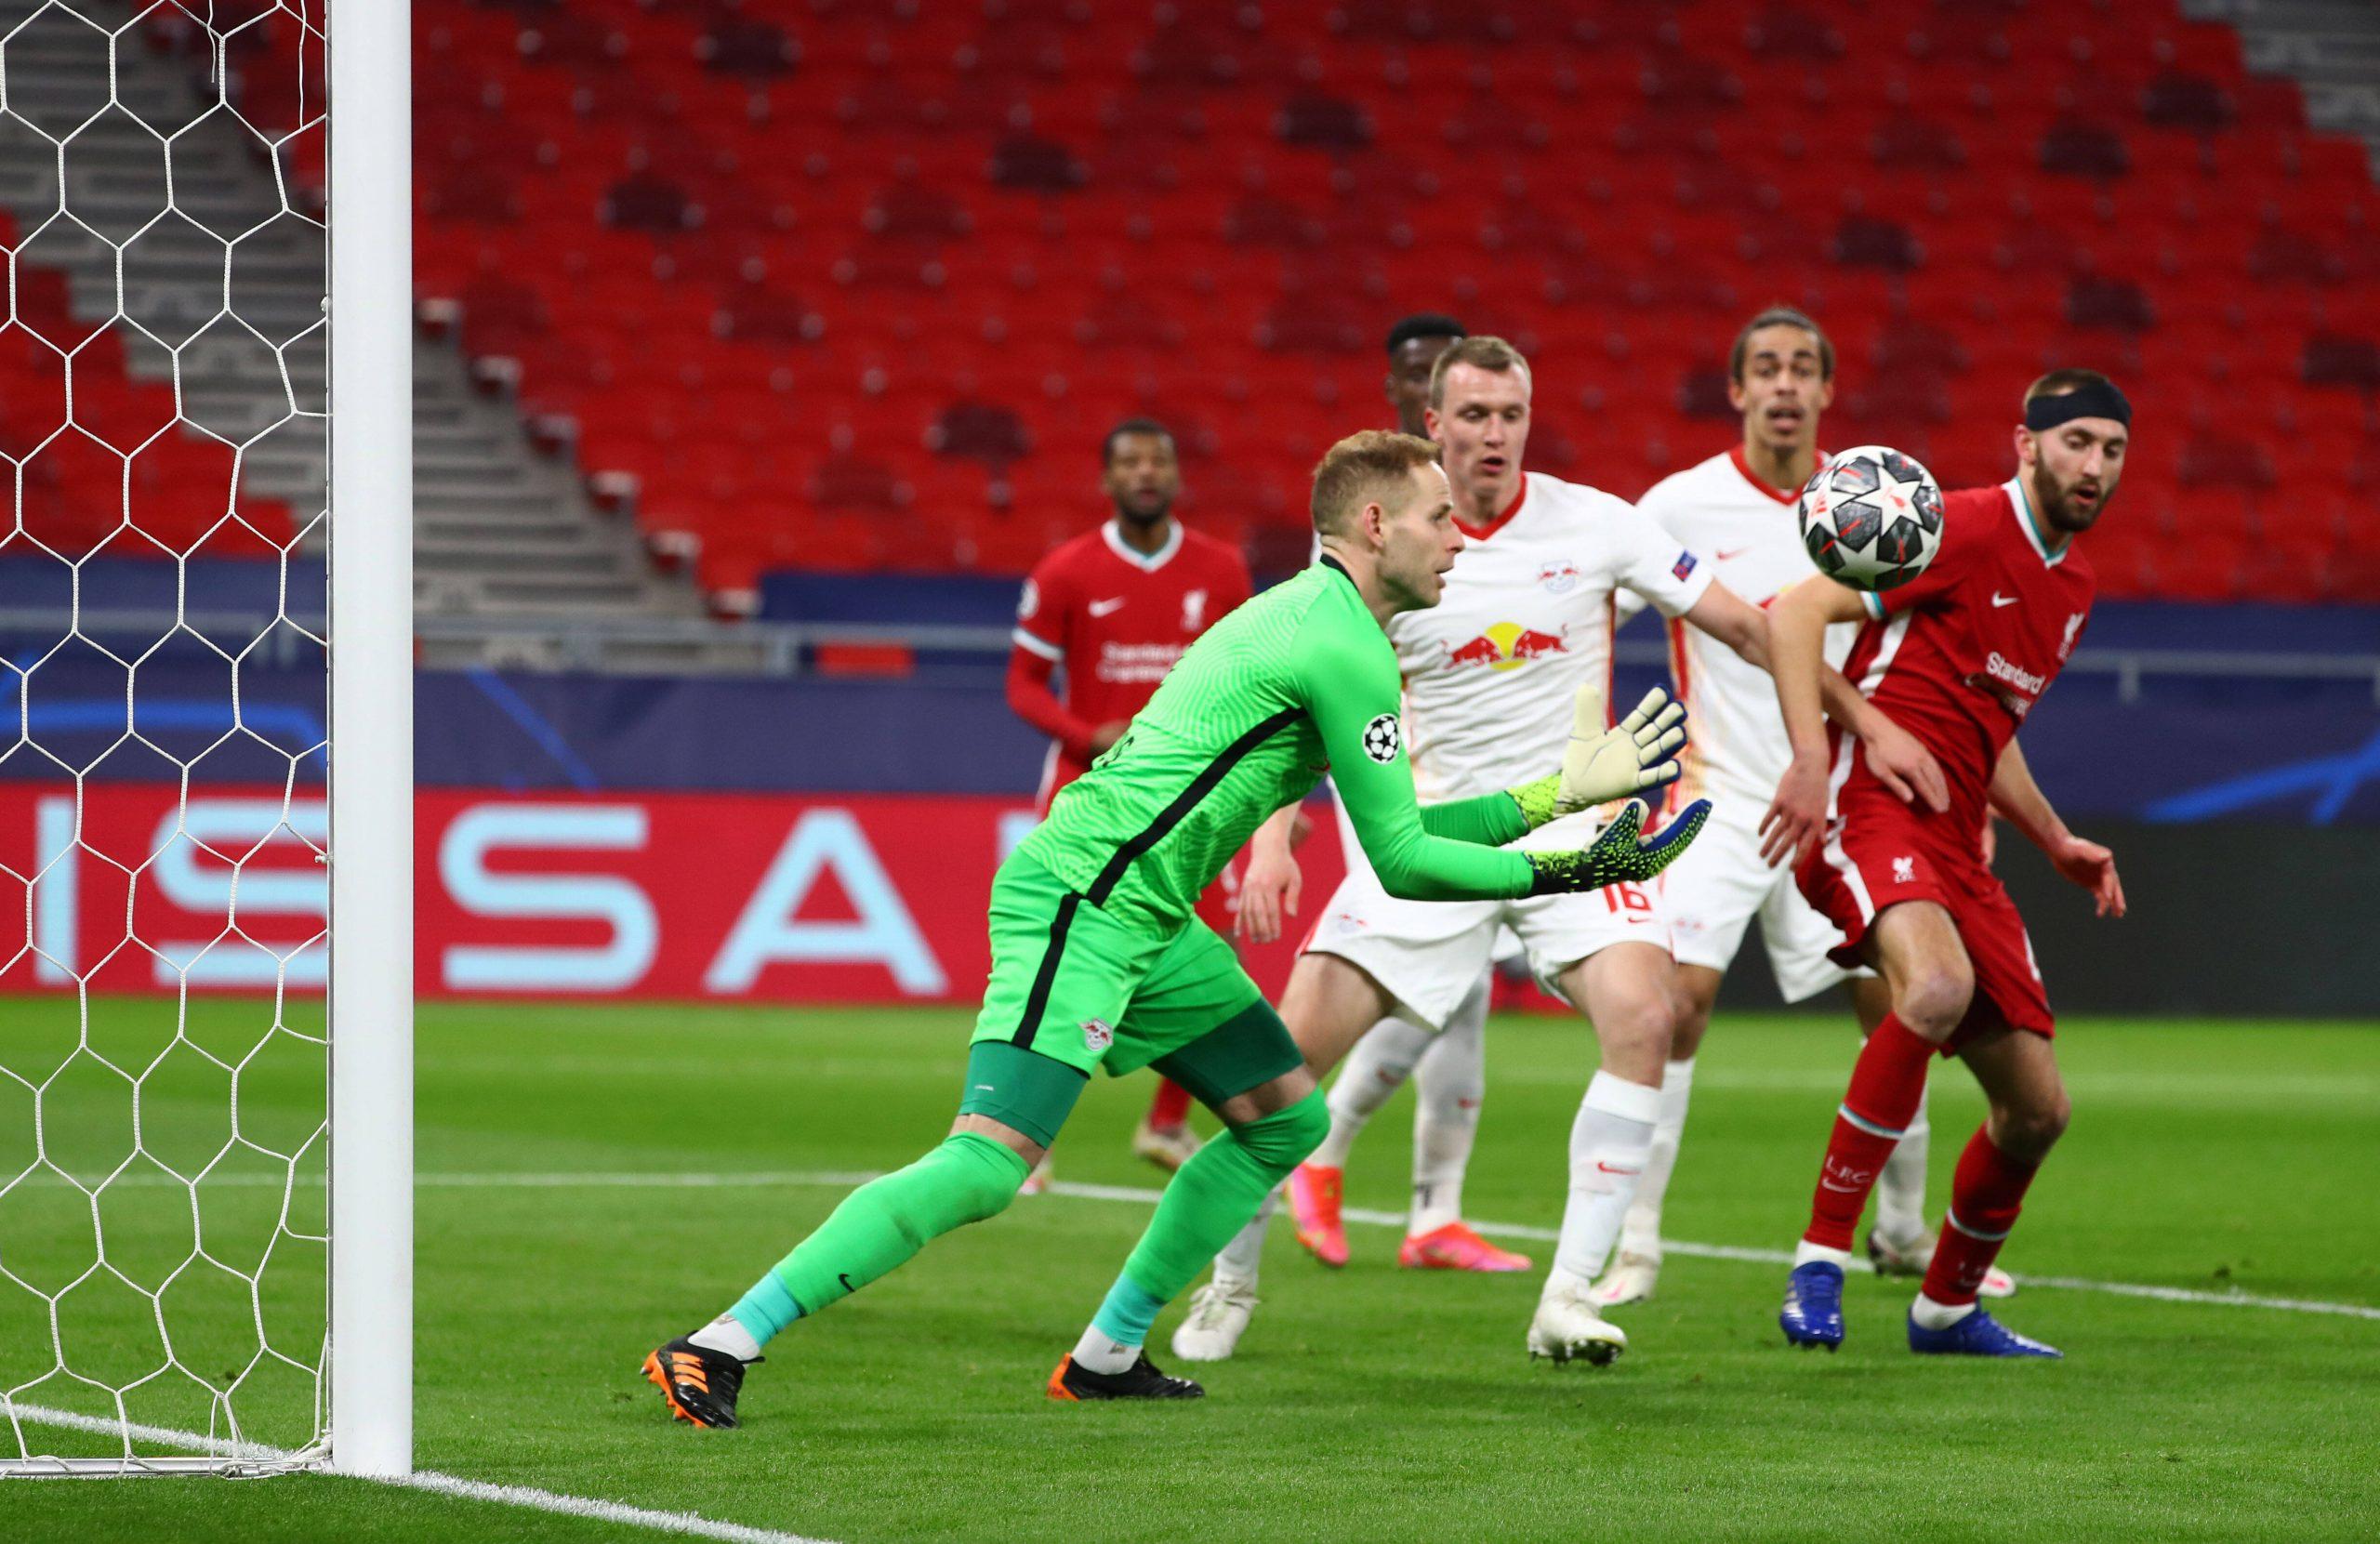 Liverpool vs RB Leipizg - Peter Gulacsi